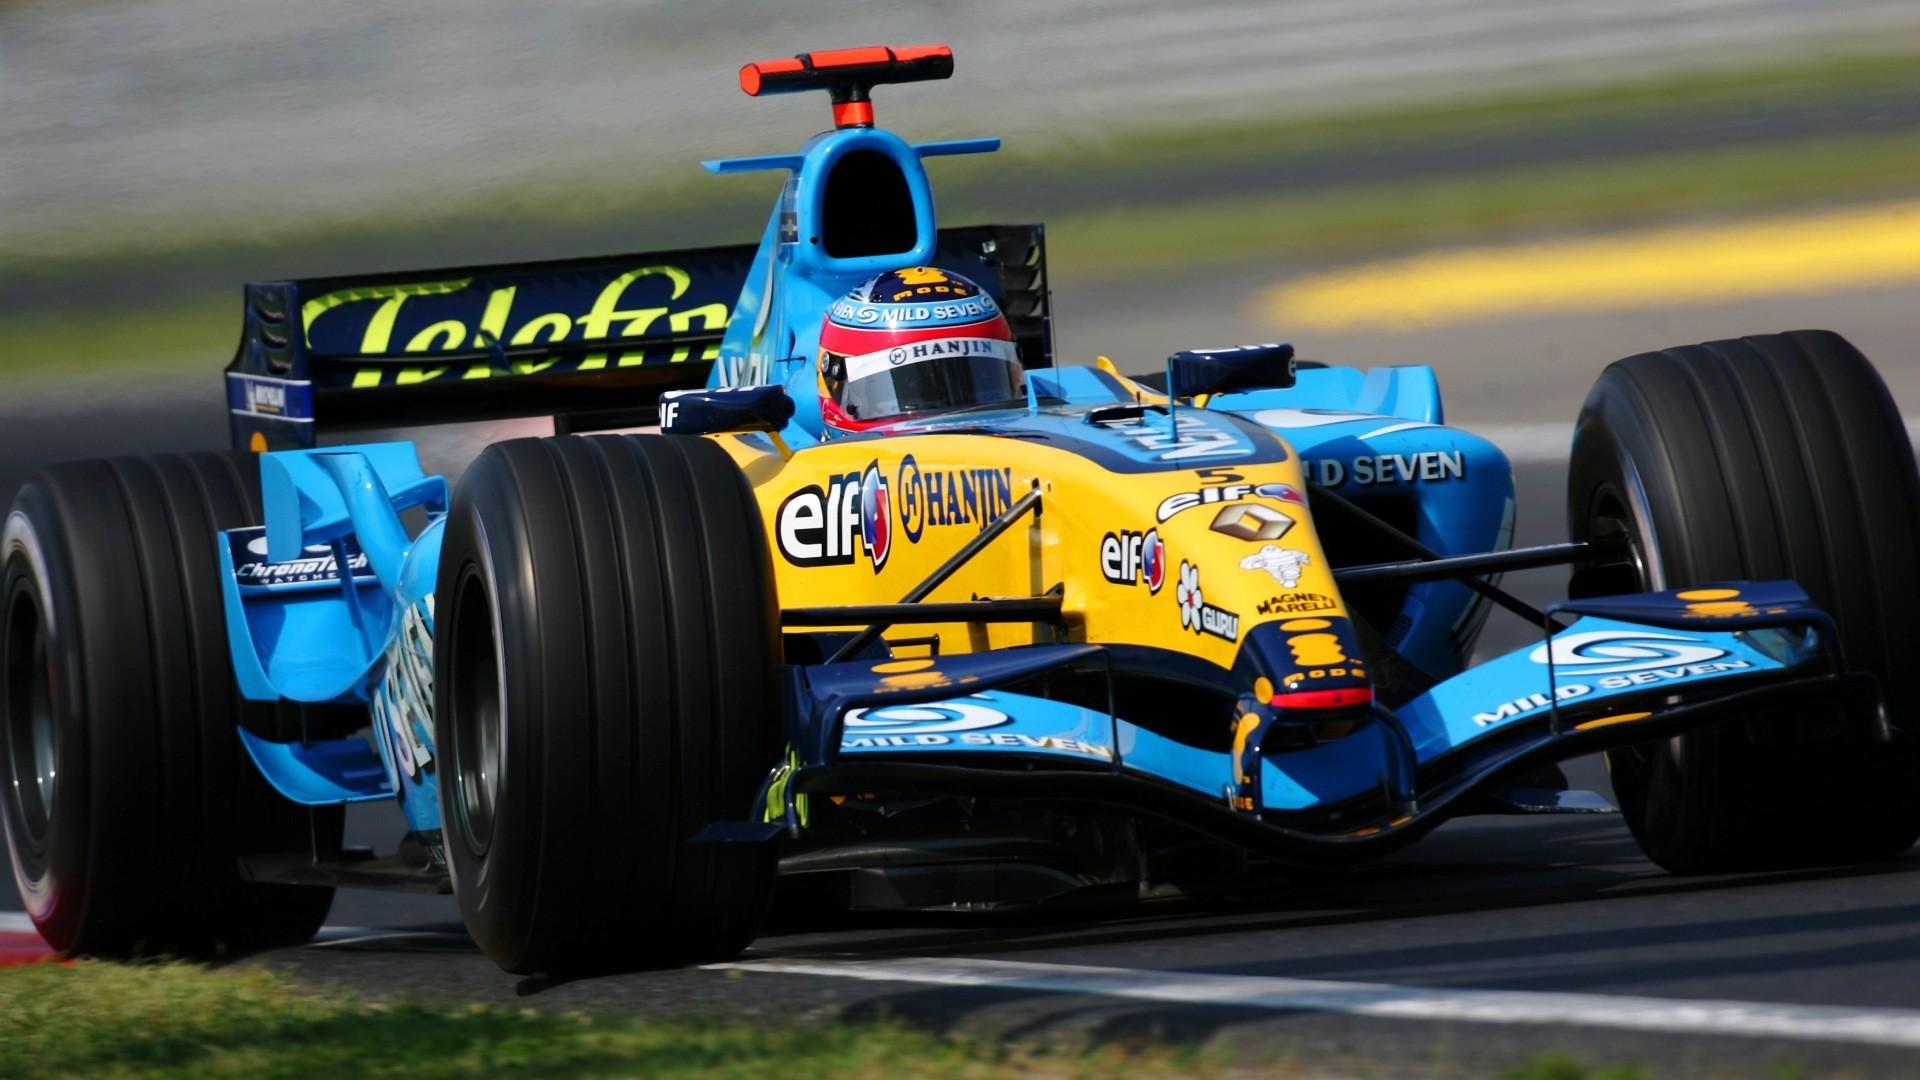 Fondos De Pantalla 1920x1080 Px Fernando Alonso Renault